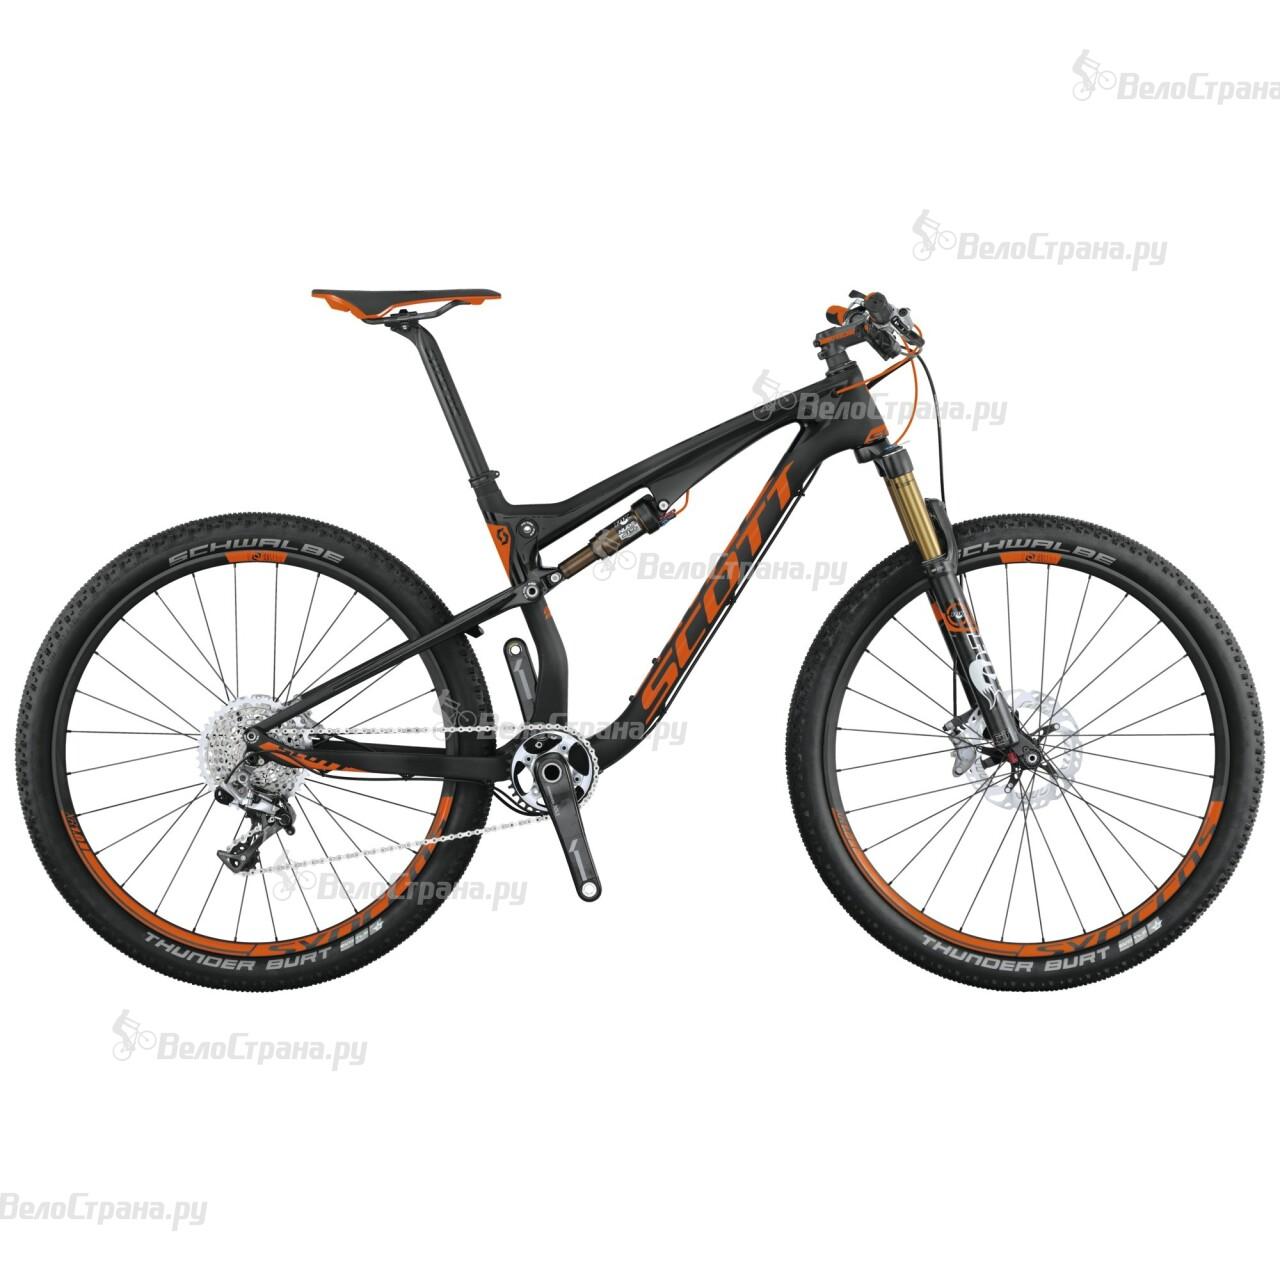 Велосипед Scott Spark 700 SL (2015) scott addict sl compact 2015